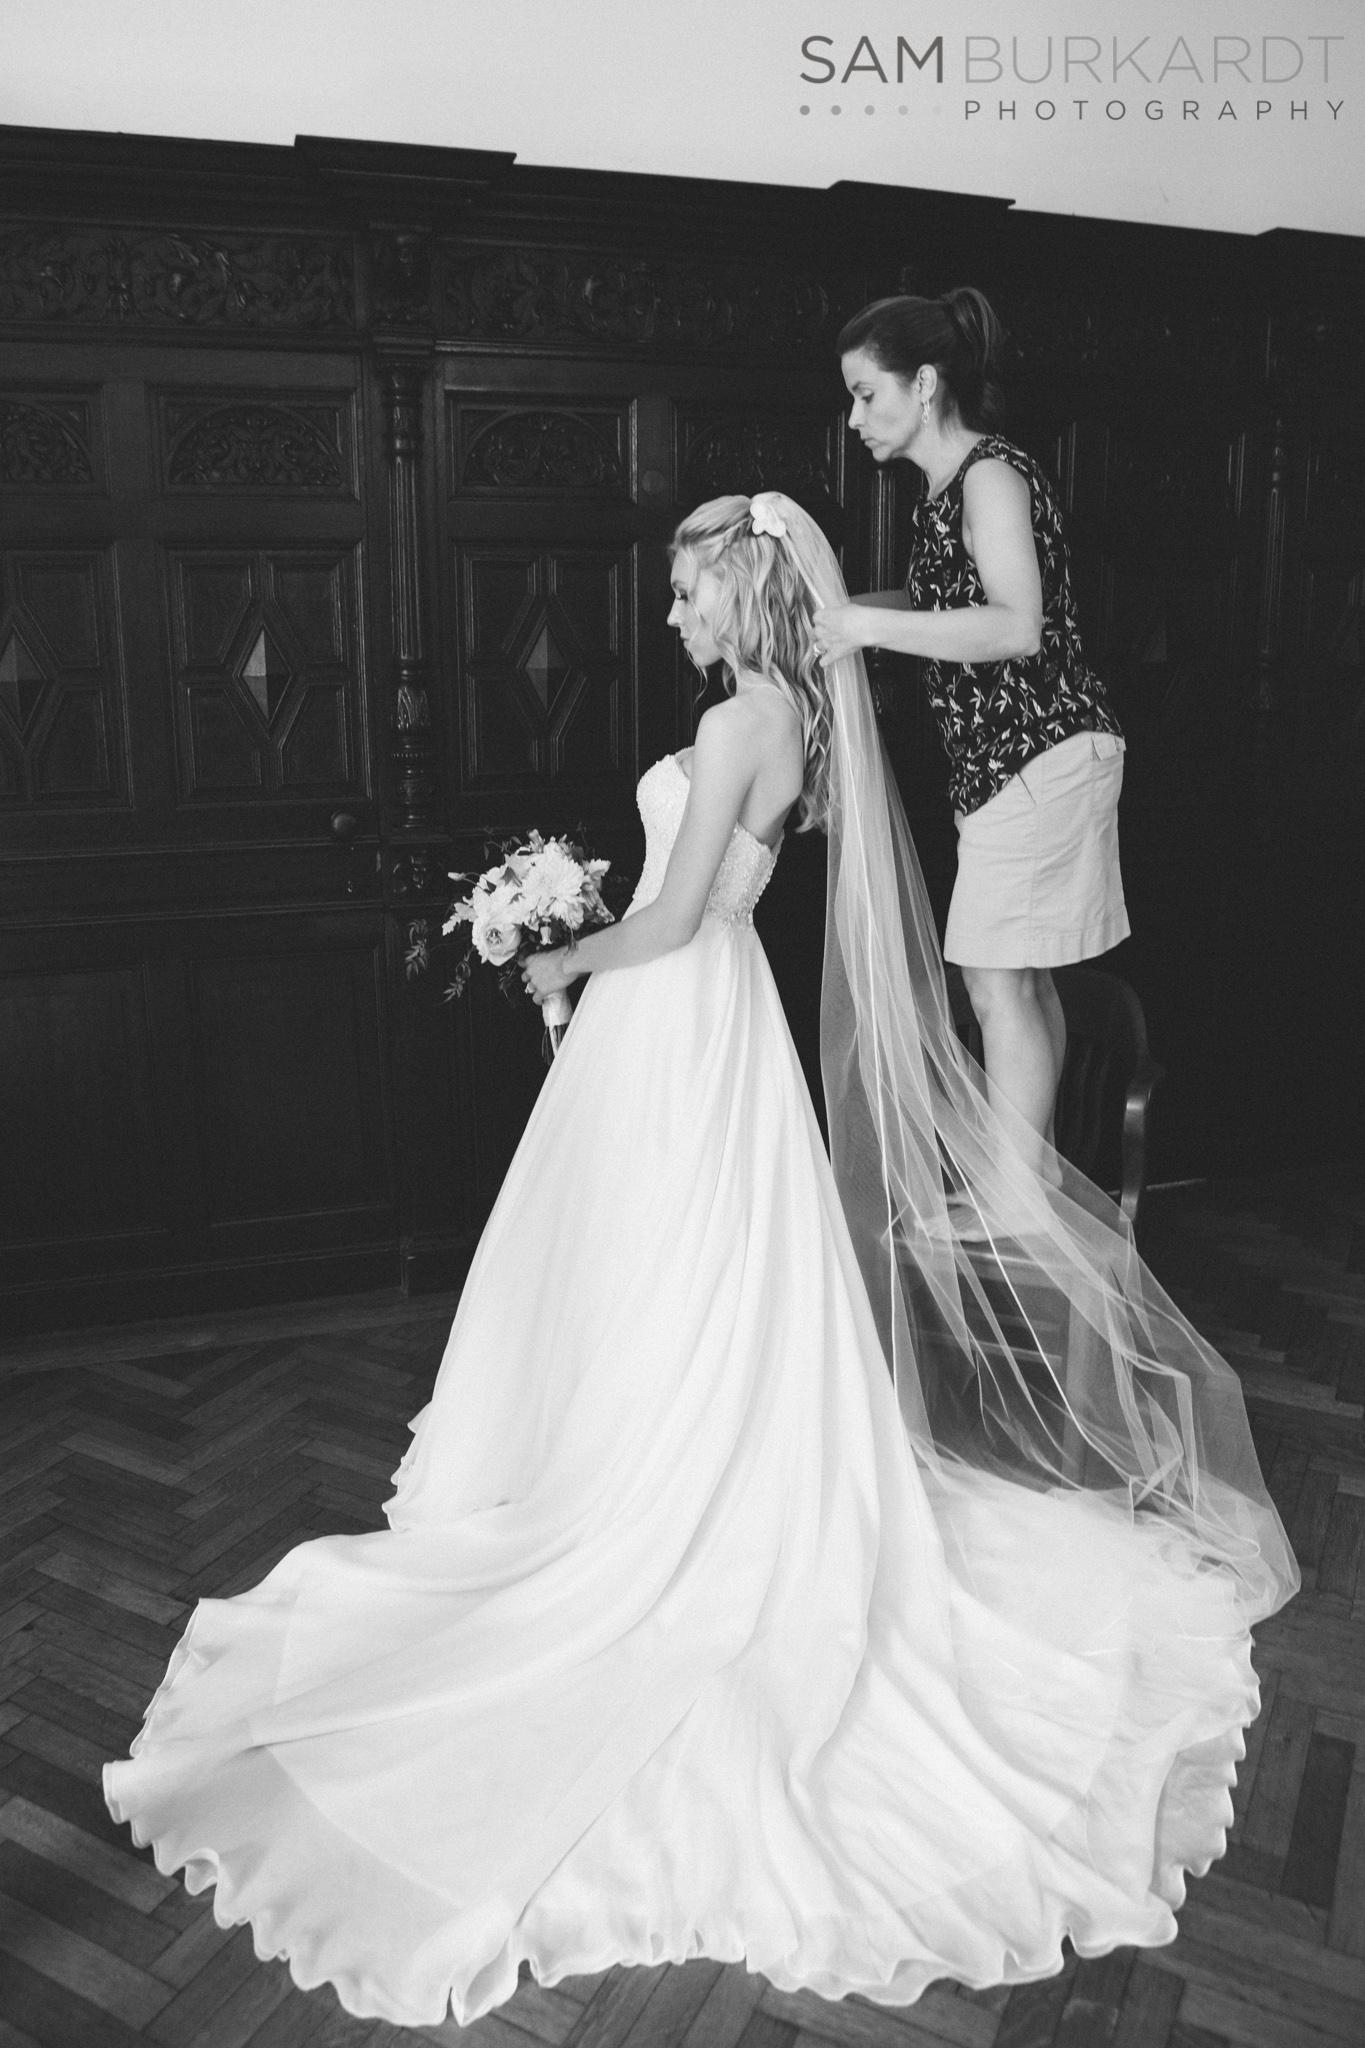 samburkardt_platz_moore_connecticut_branford_house_long_island_sound_august_photography_wedding_glamour_pink_0016.jpg